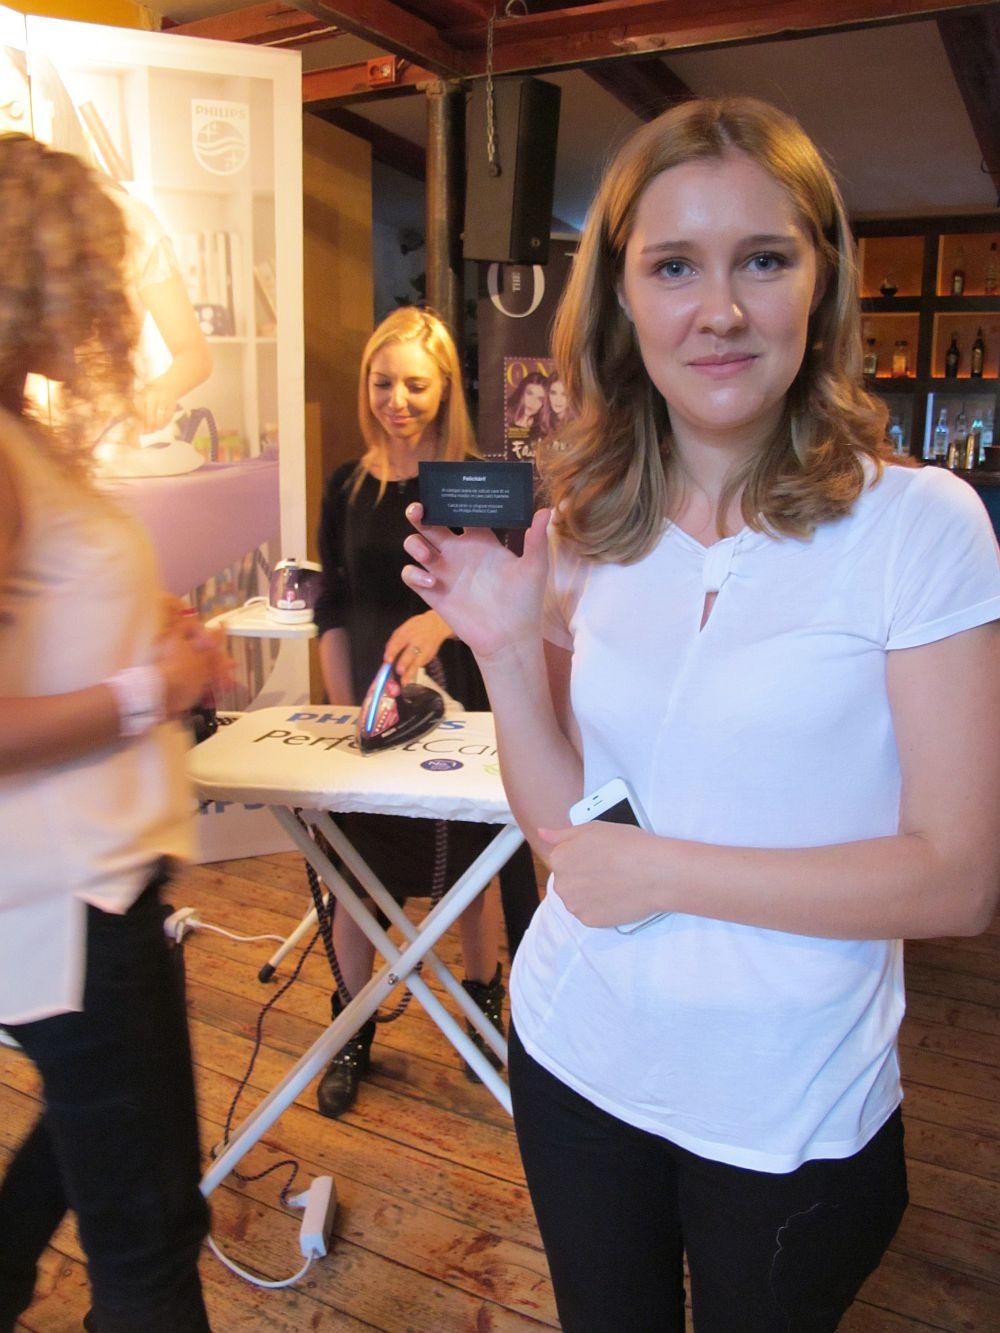 adelaparvu.com despre Concurs Philips PerfectCare statii de calcat, eveniment Olivia Steer (21)